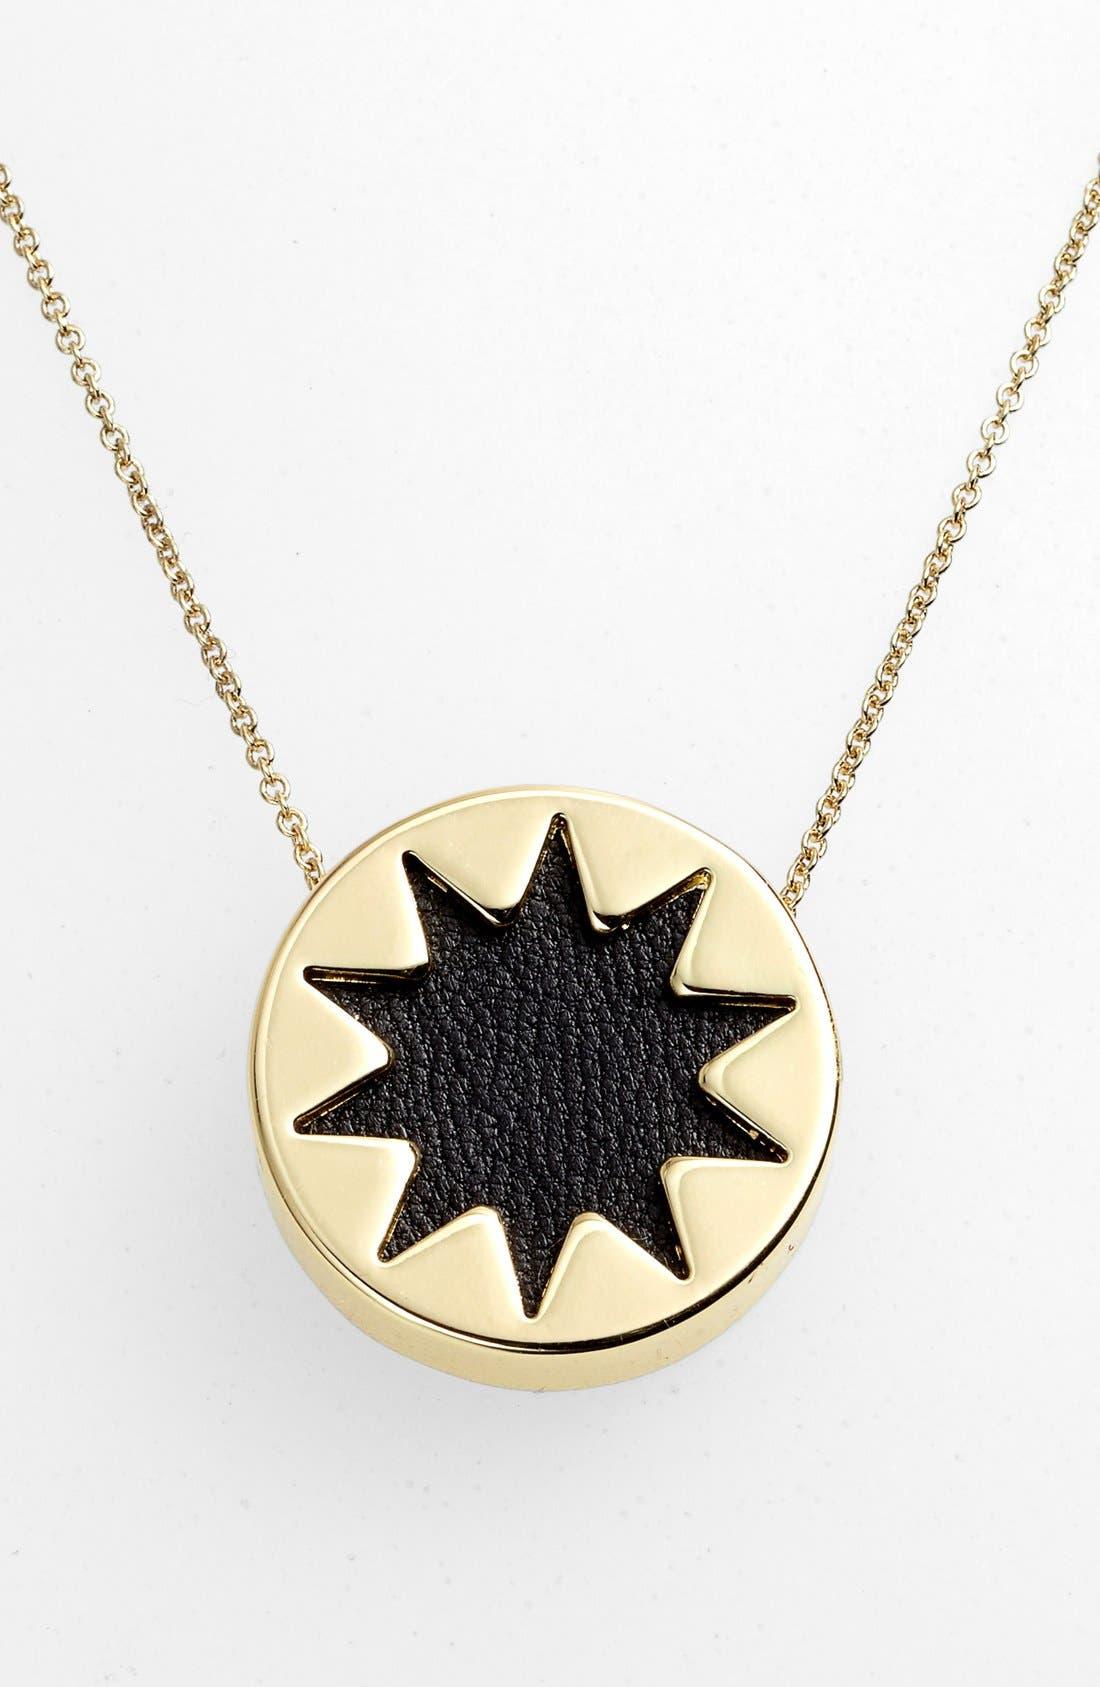 Alternate Image 1 Selected - House of Harlow 1960 Mini Sunburst Pendant Necklace (Online Only)